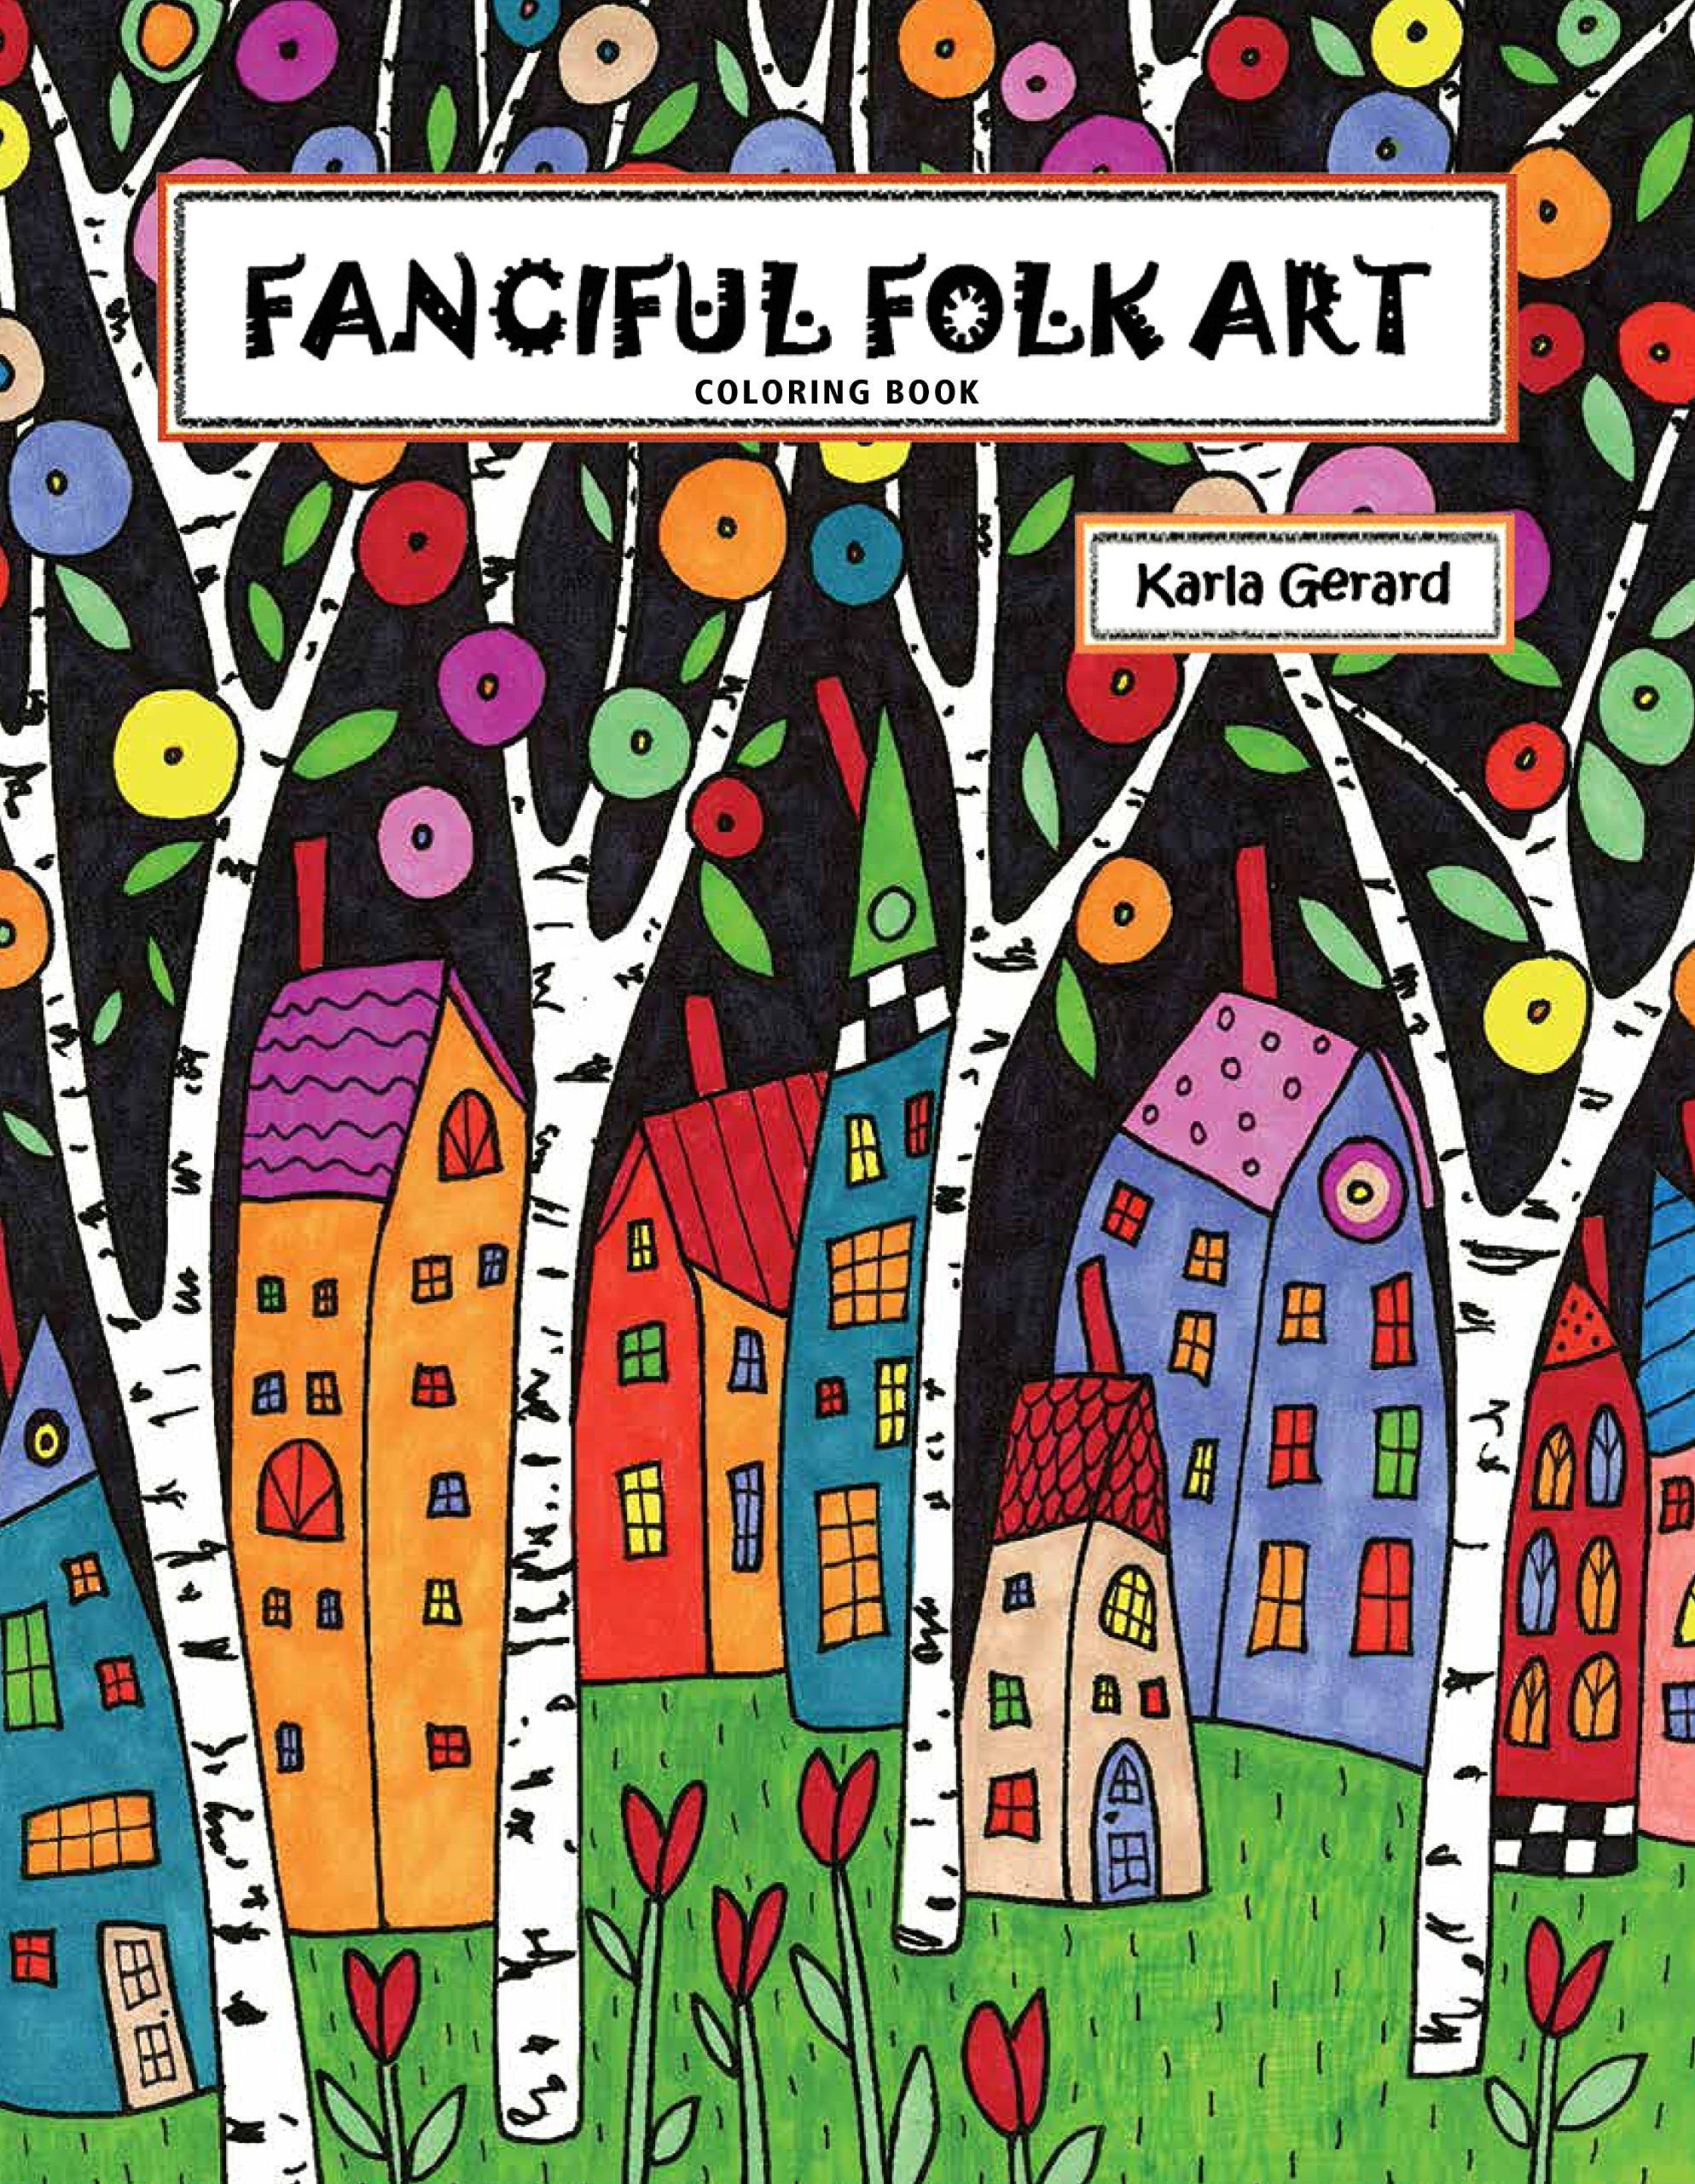 RUG HOOKING CRAFT PAPER PATTERN Houses Abstract PRIMITIVE FOLK ART Karla Gerard